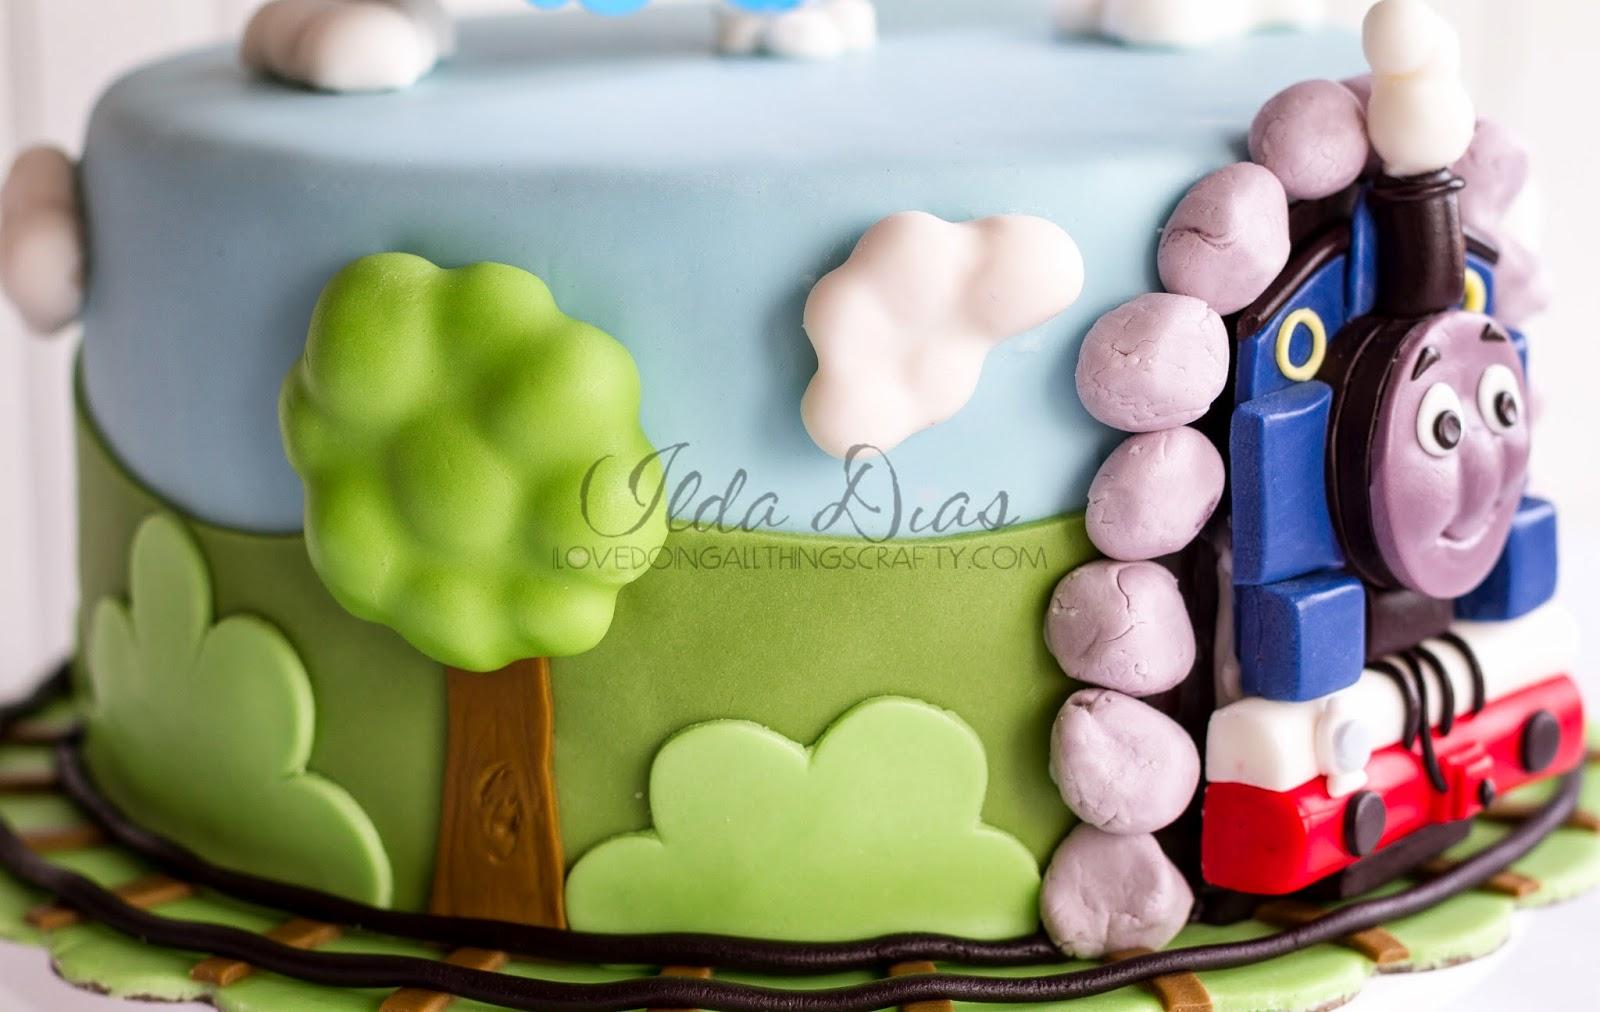 I Love Doing All Things Crafty Thomas The Train Birthday Cake